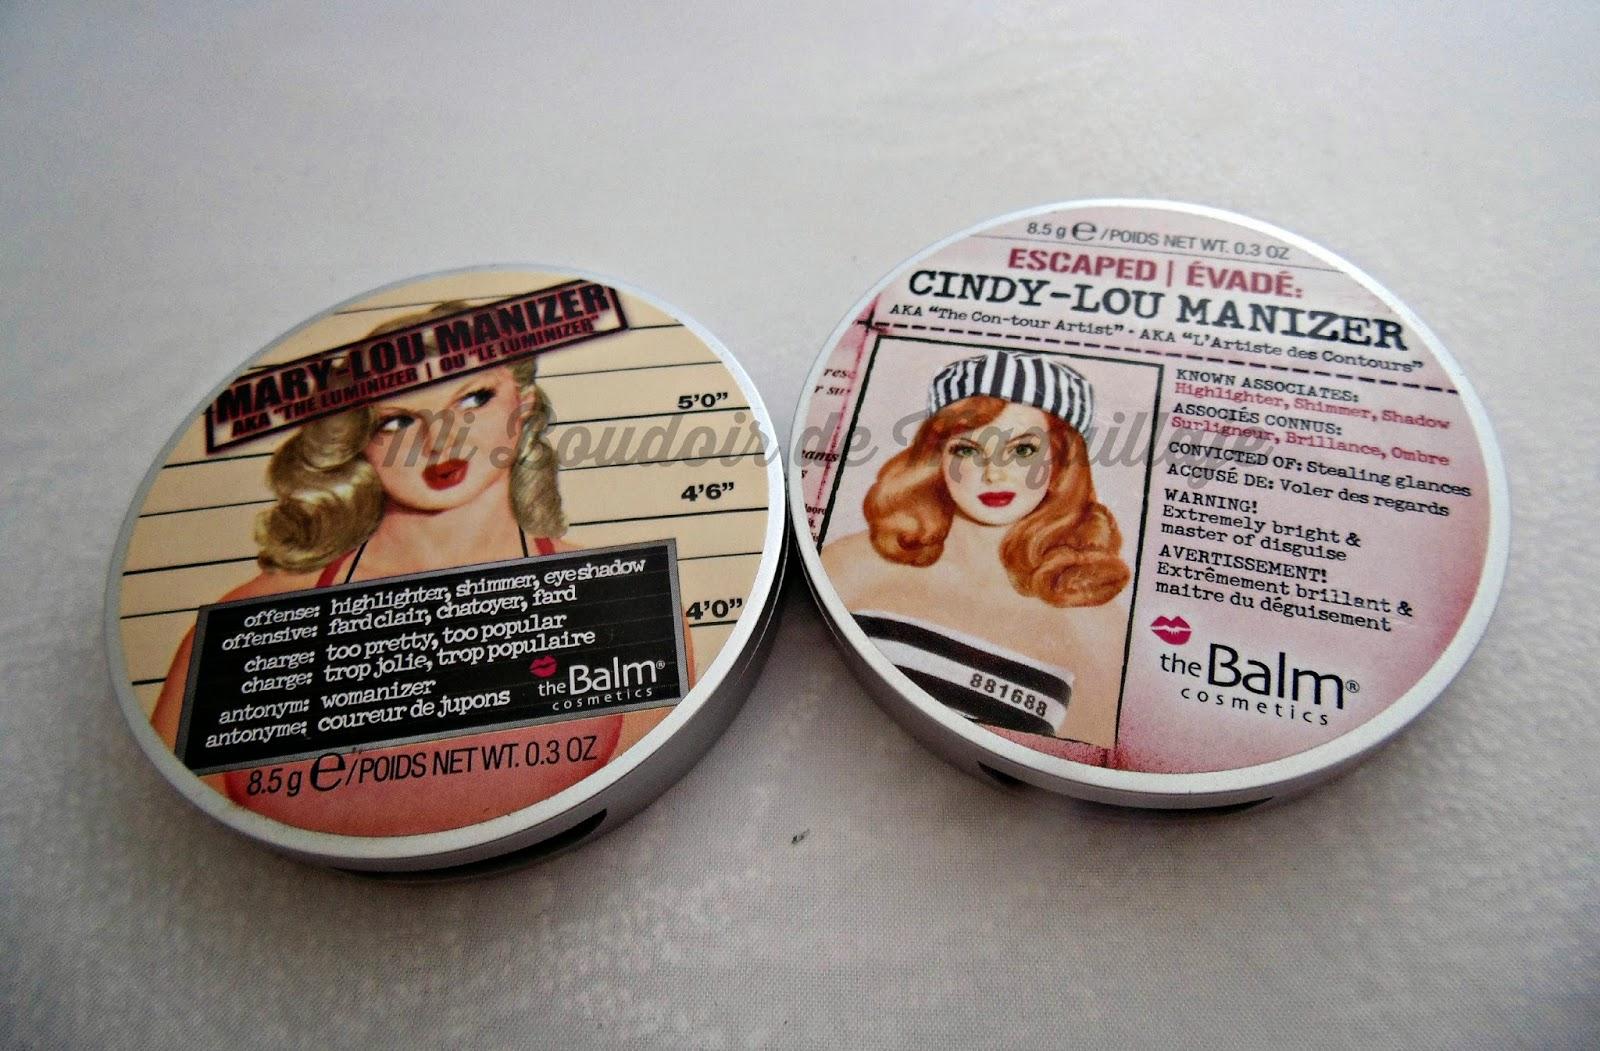 The Balm Mary-Lou Cindy-Lou Manizer